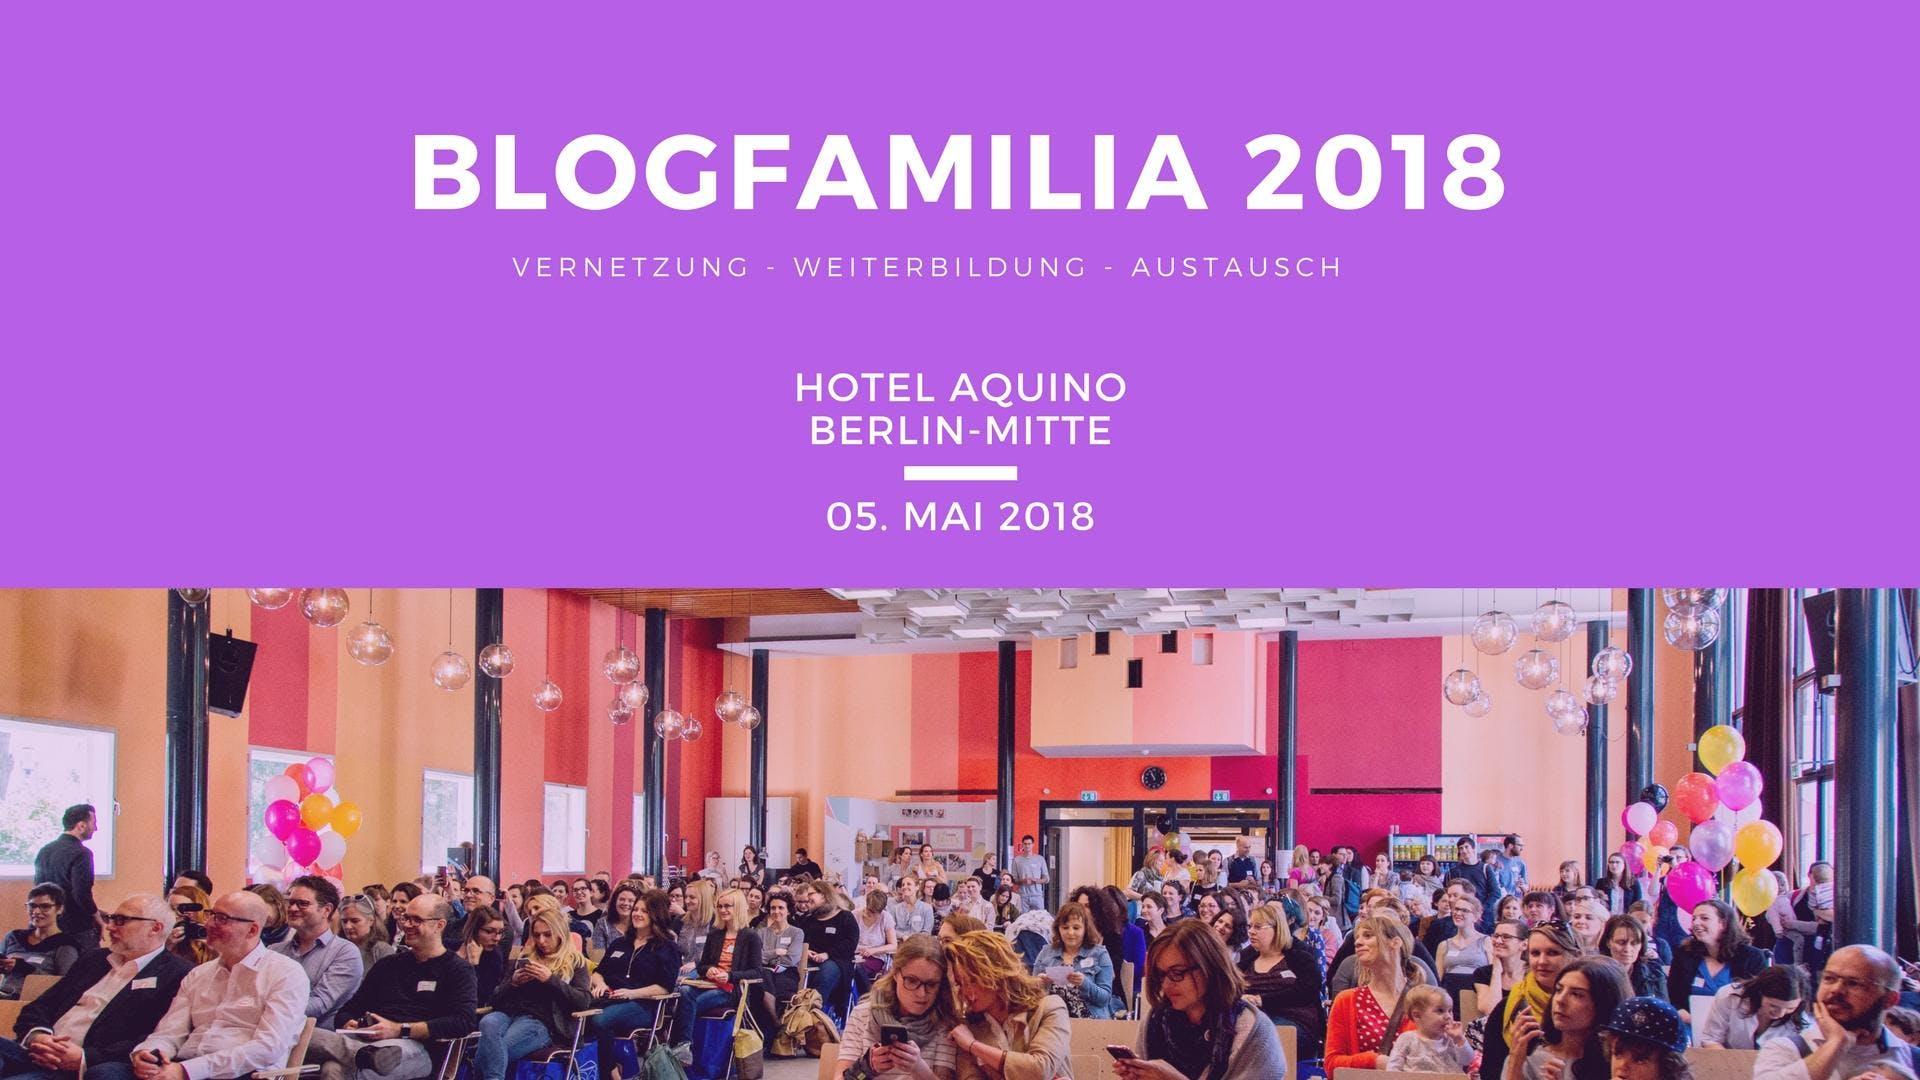 Blogfamilia 2018 - Jahreskonferenz #Blogfamil